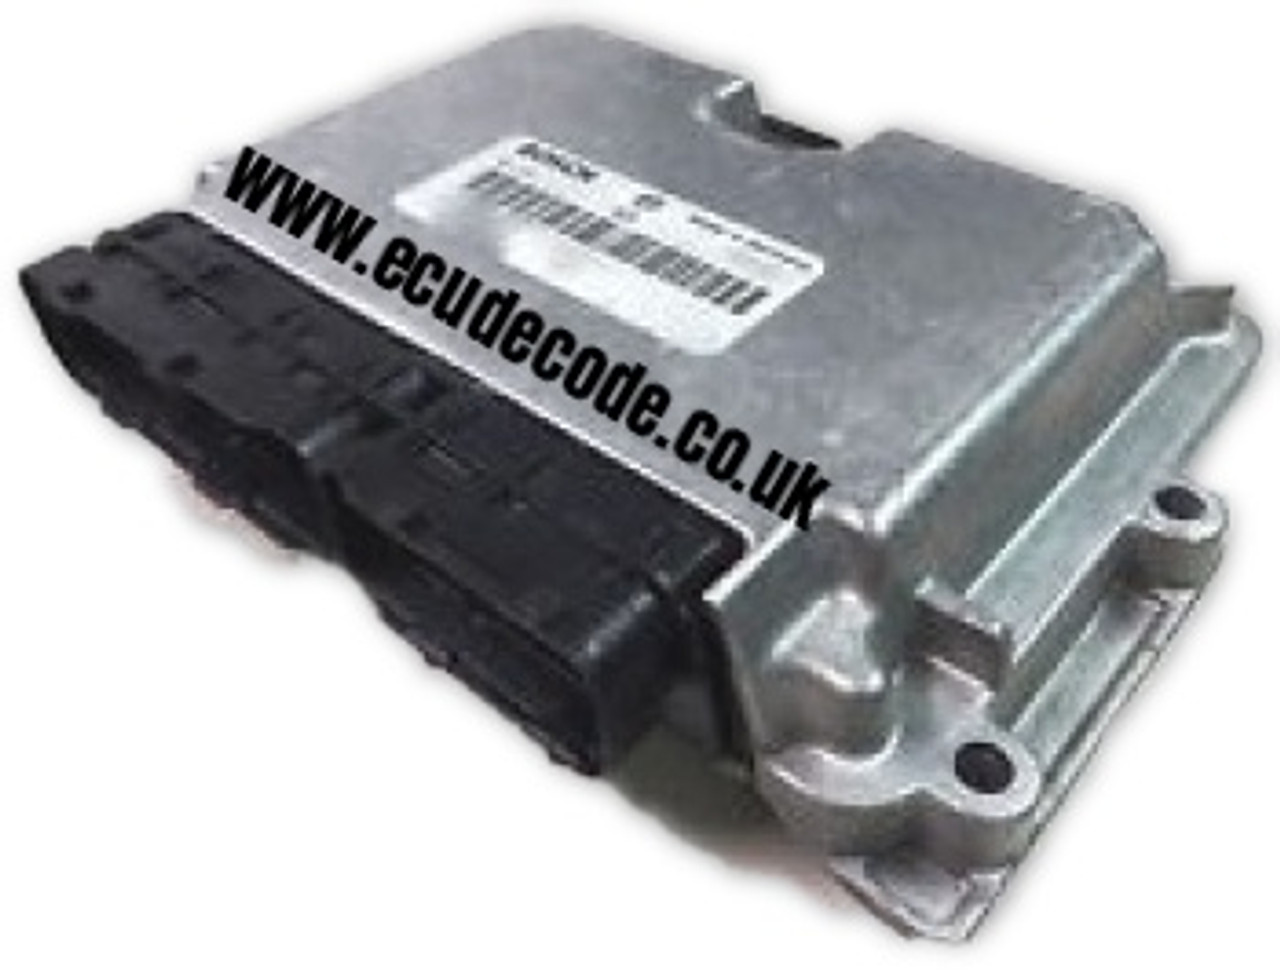 "0 281 012 597, 0281012597, 96 583 099 80, 9658309980, Citroen - Peugeot - Fiat Diesel Engine ECU  "" Plug & Play """